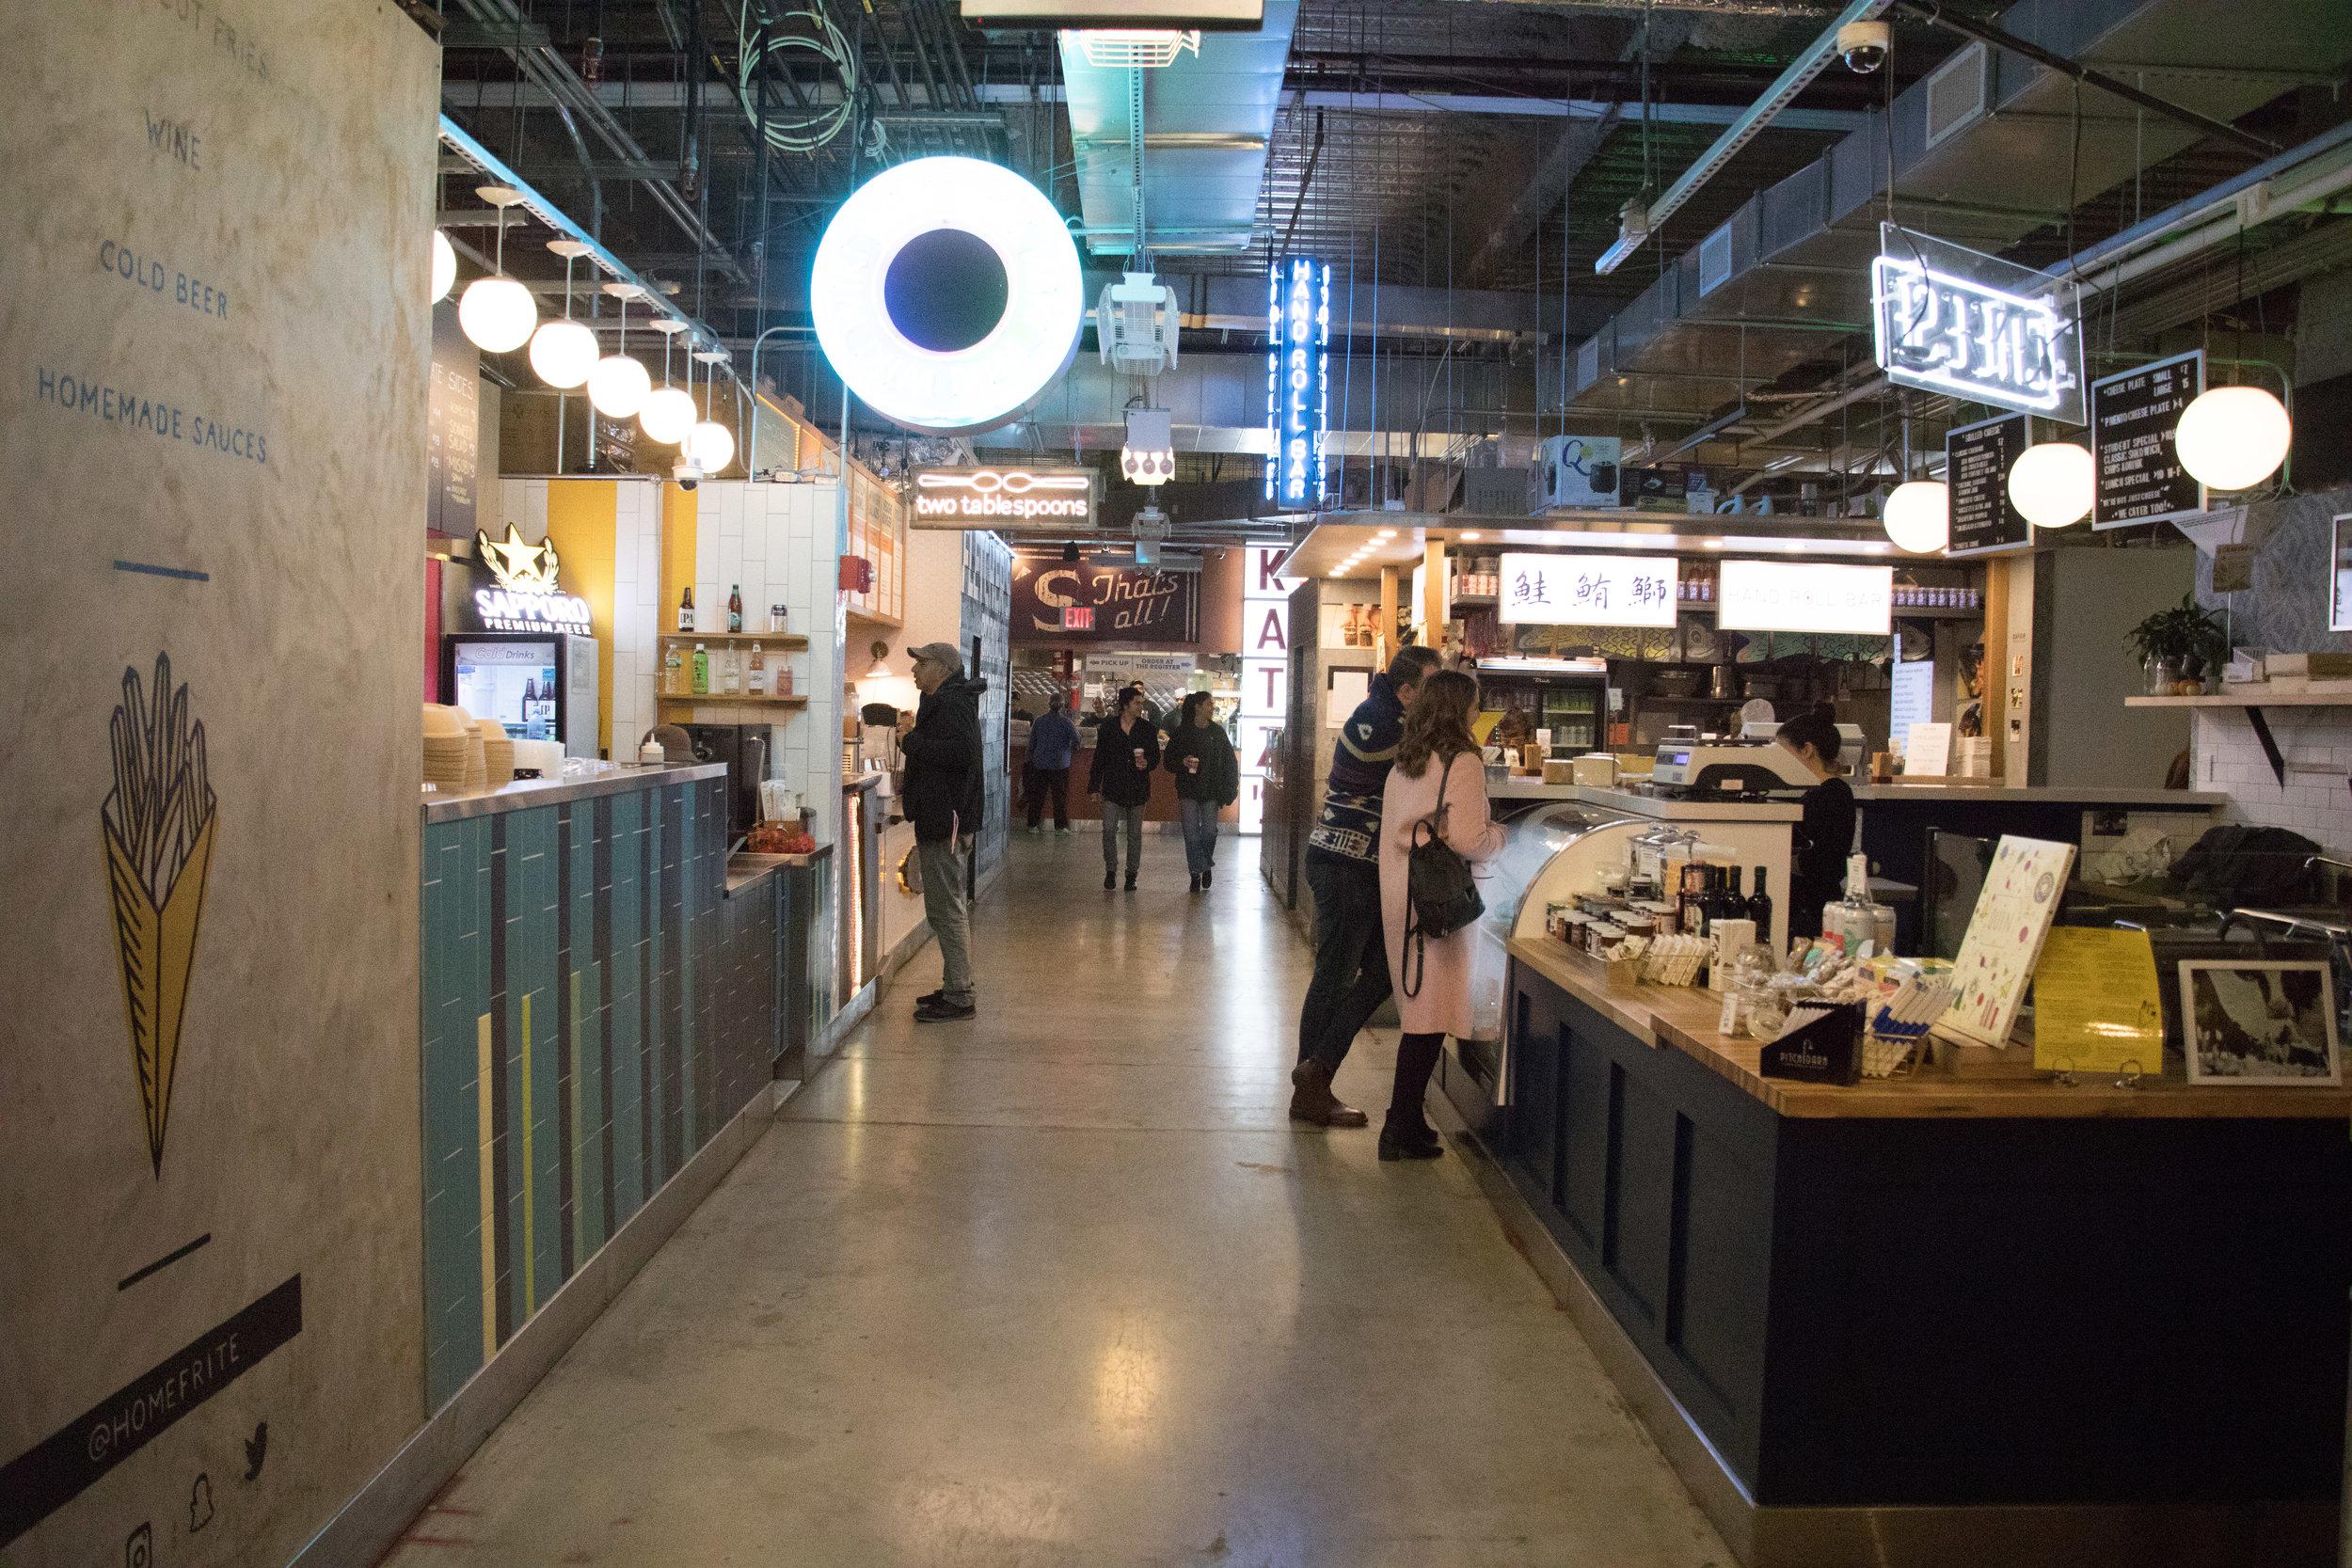 LSNY_Dekalb_Market_Hall-25.jpg